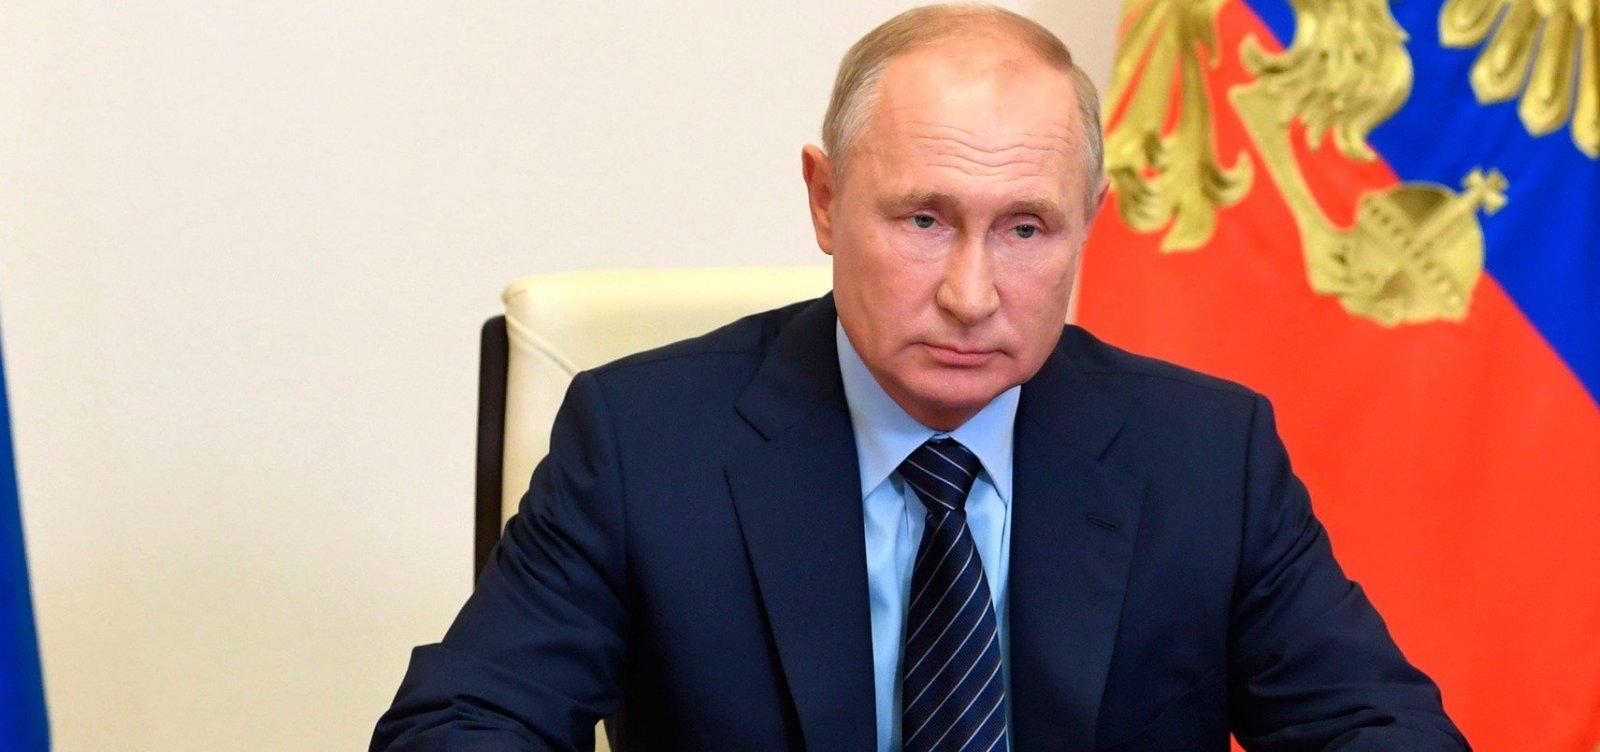 [Rússia registra primeira vacina contra o coronavírus]